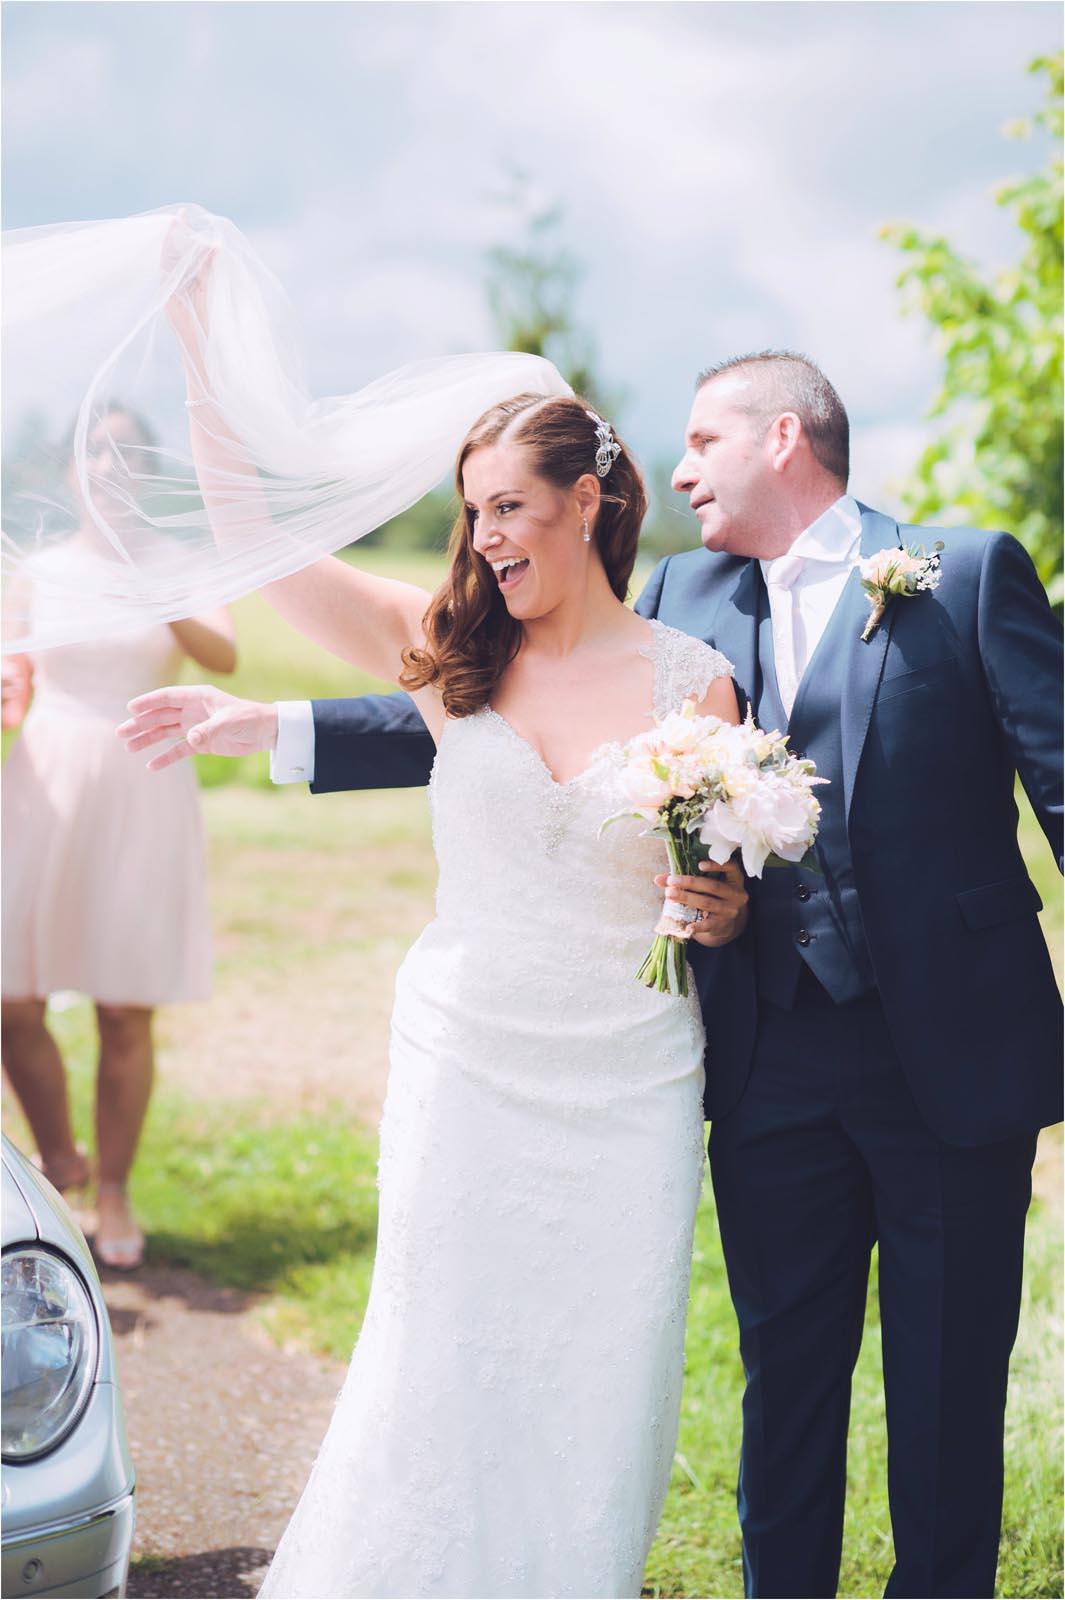 Simon biffen wedding photography 0056